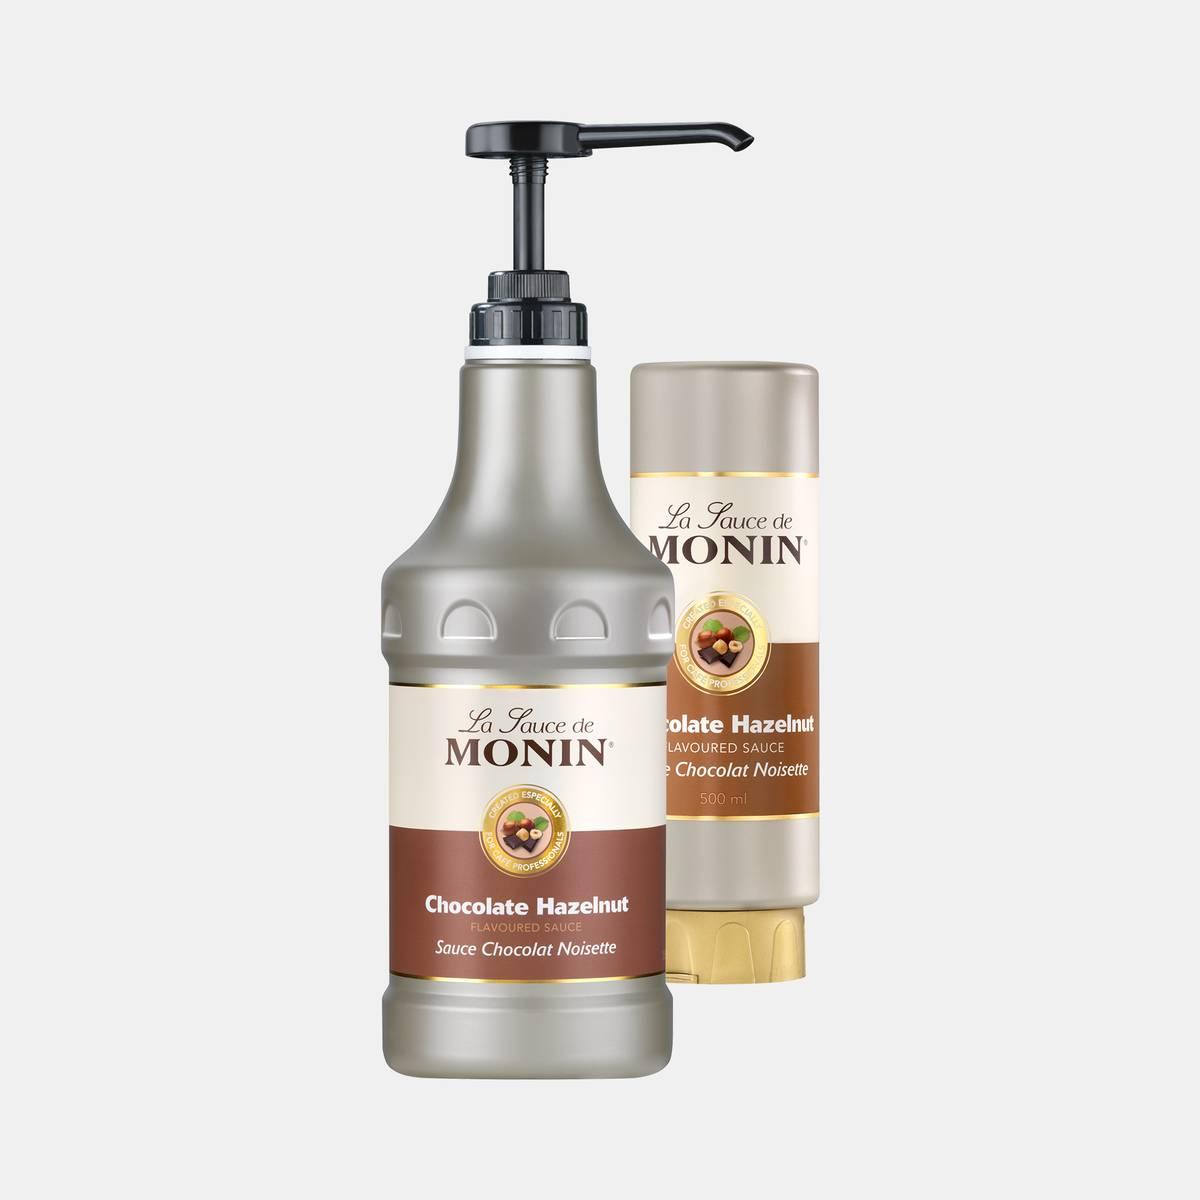 Monin Chocolate Hazelnut Sauce